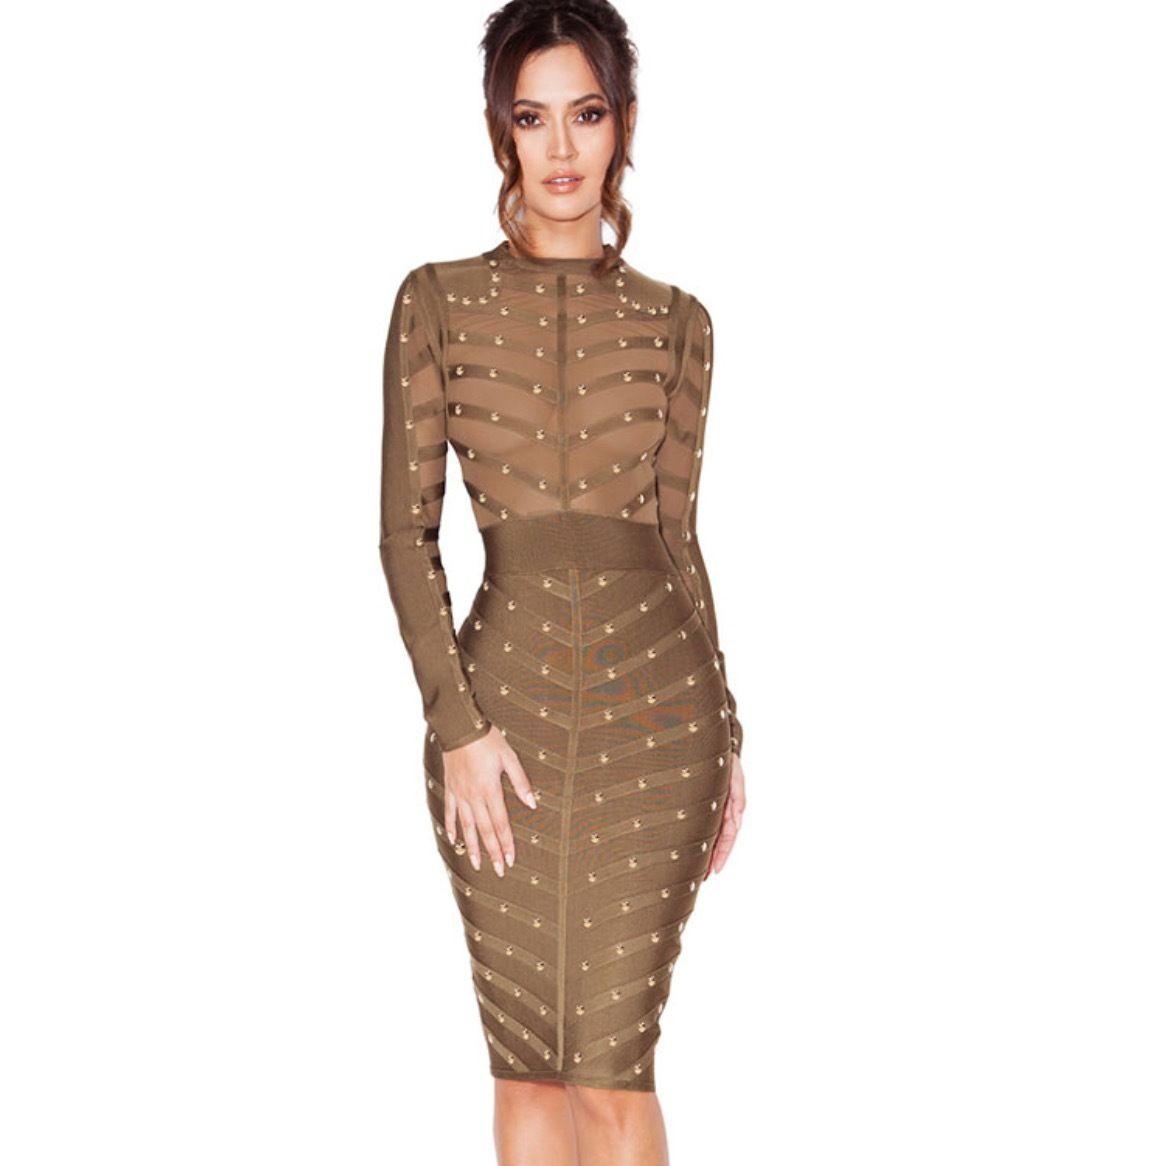 Storm Gold Studded Dress - Abruzzo Clothing